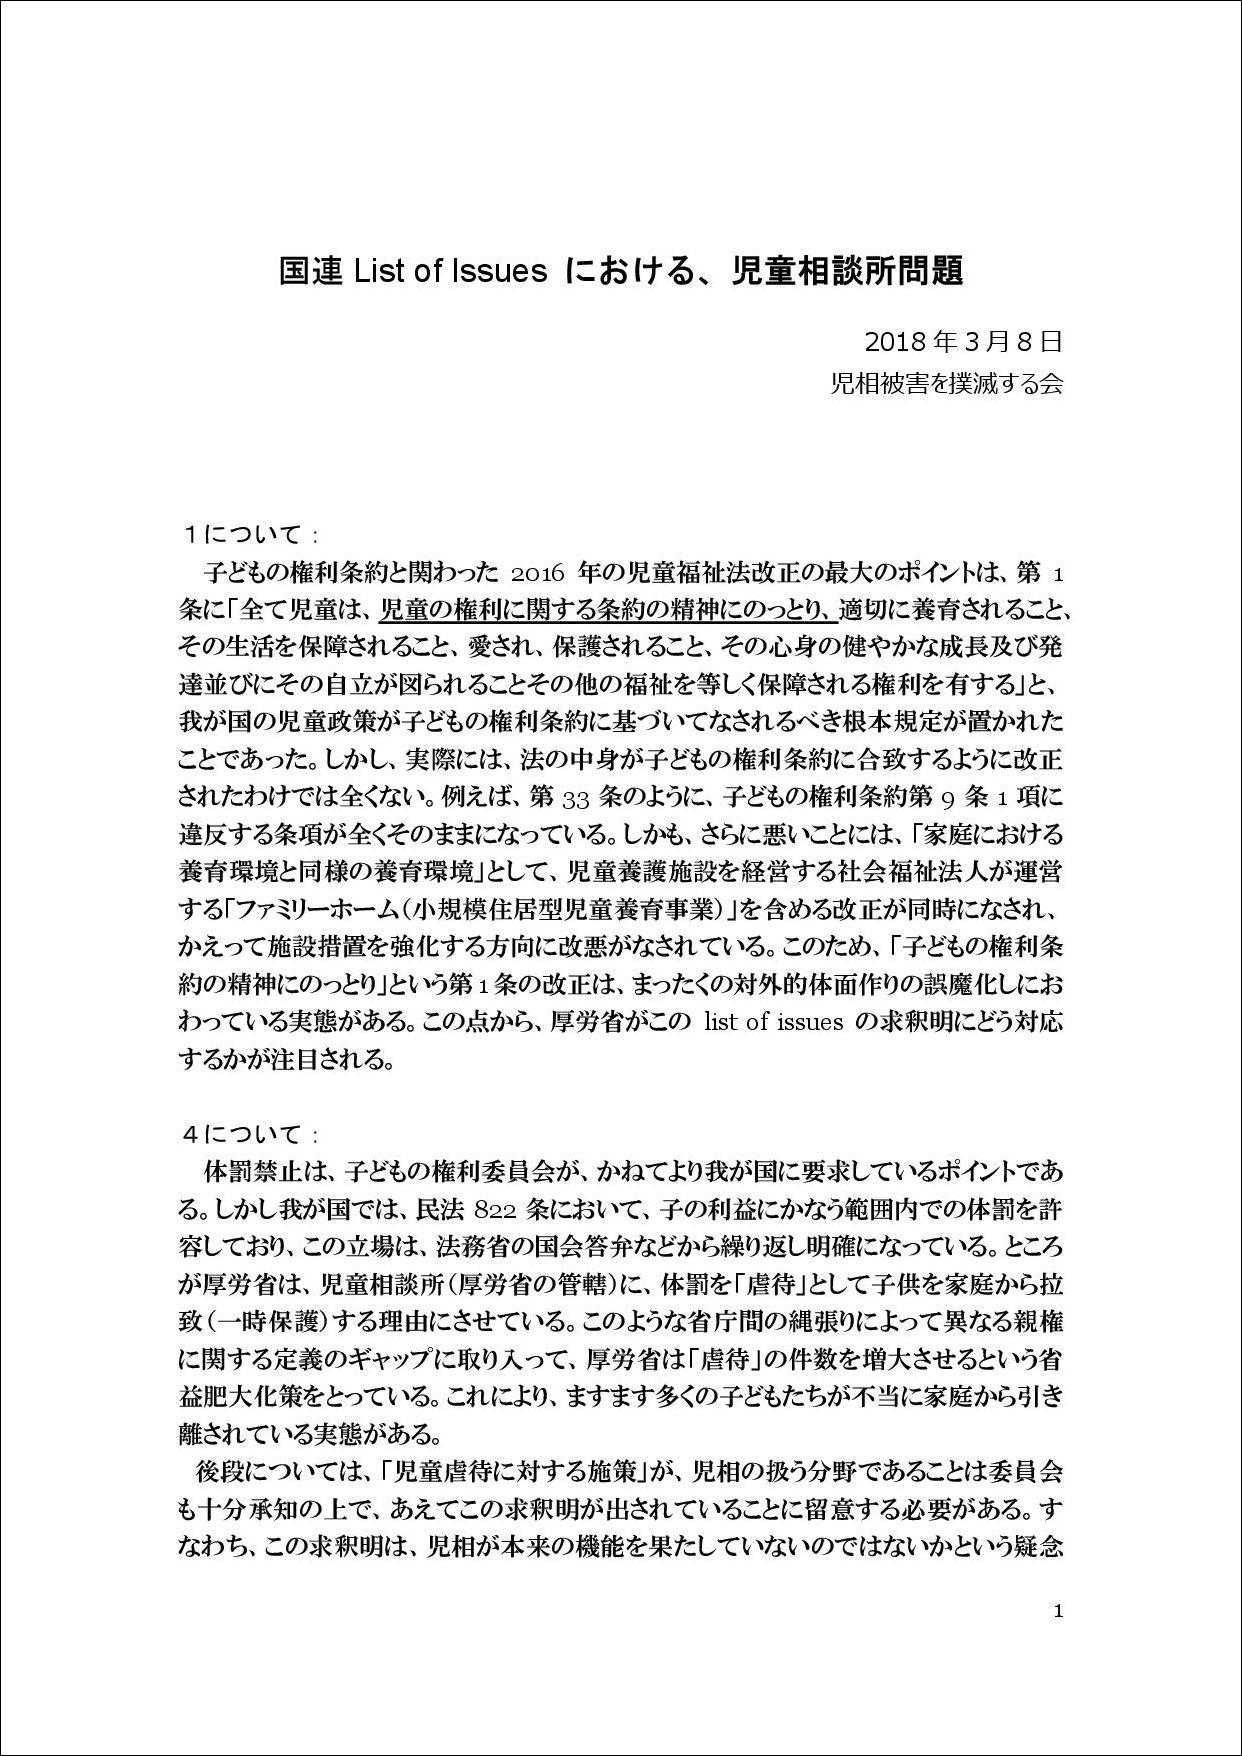 list_of_Issue_2018児相被害を撲滅する会見解-001